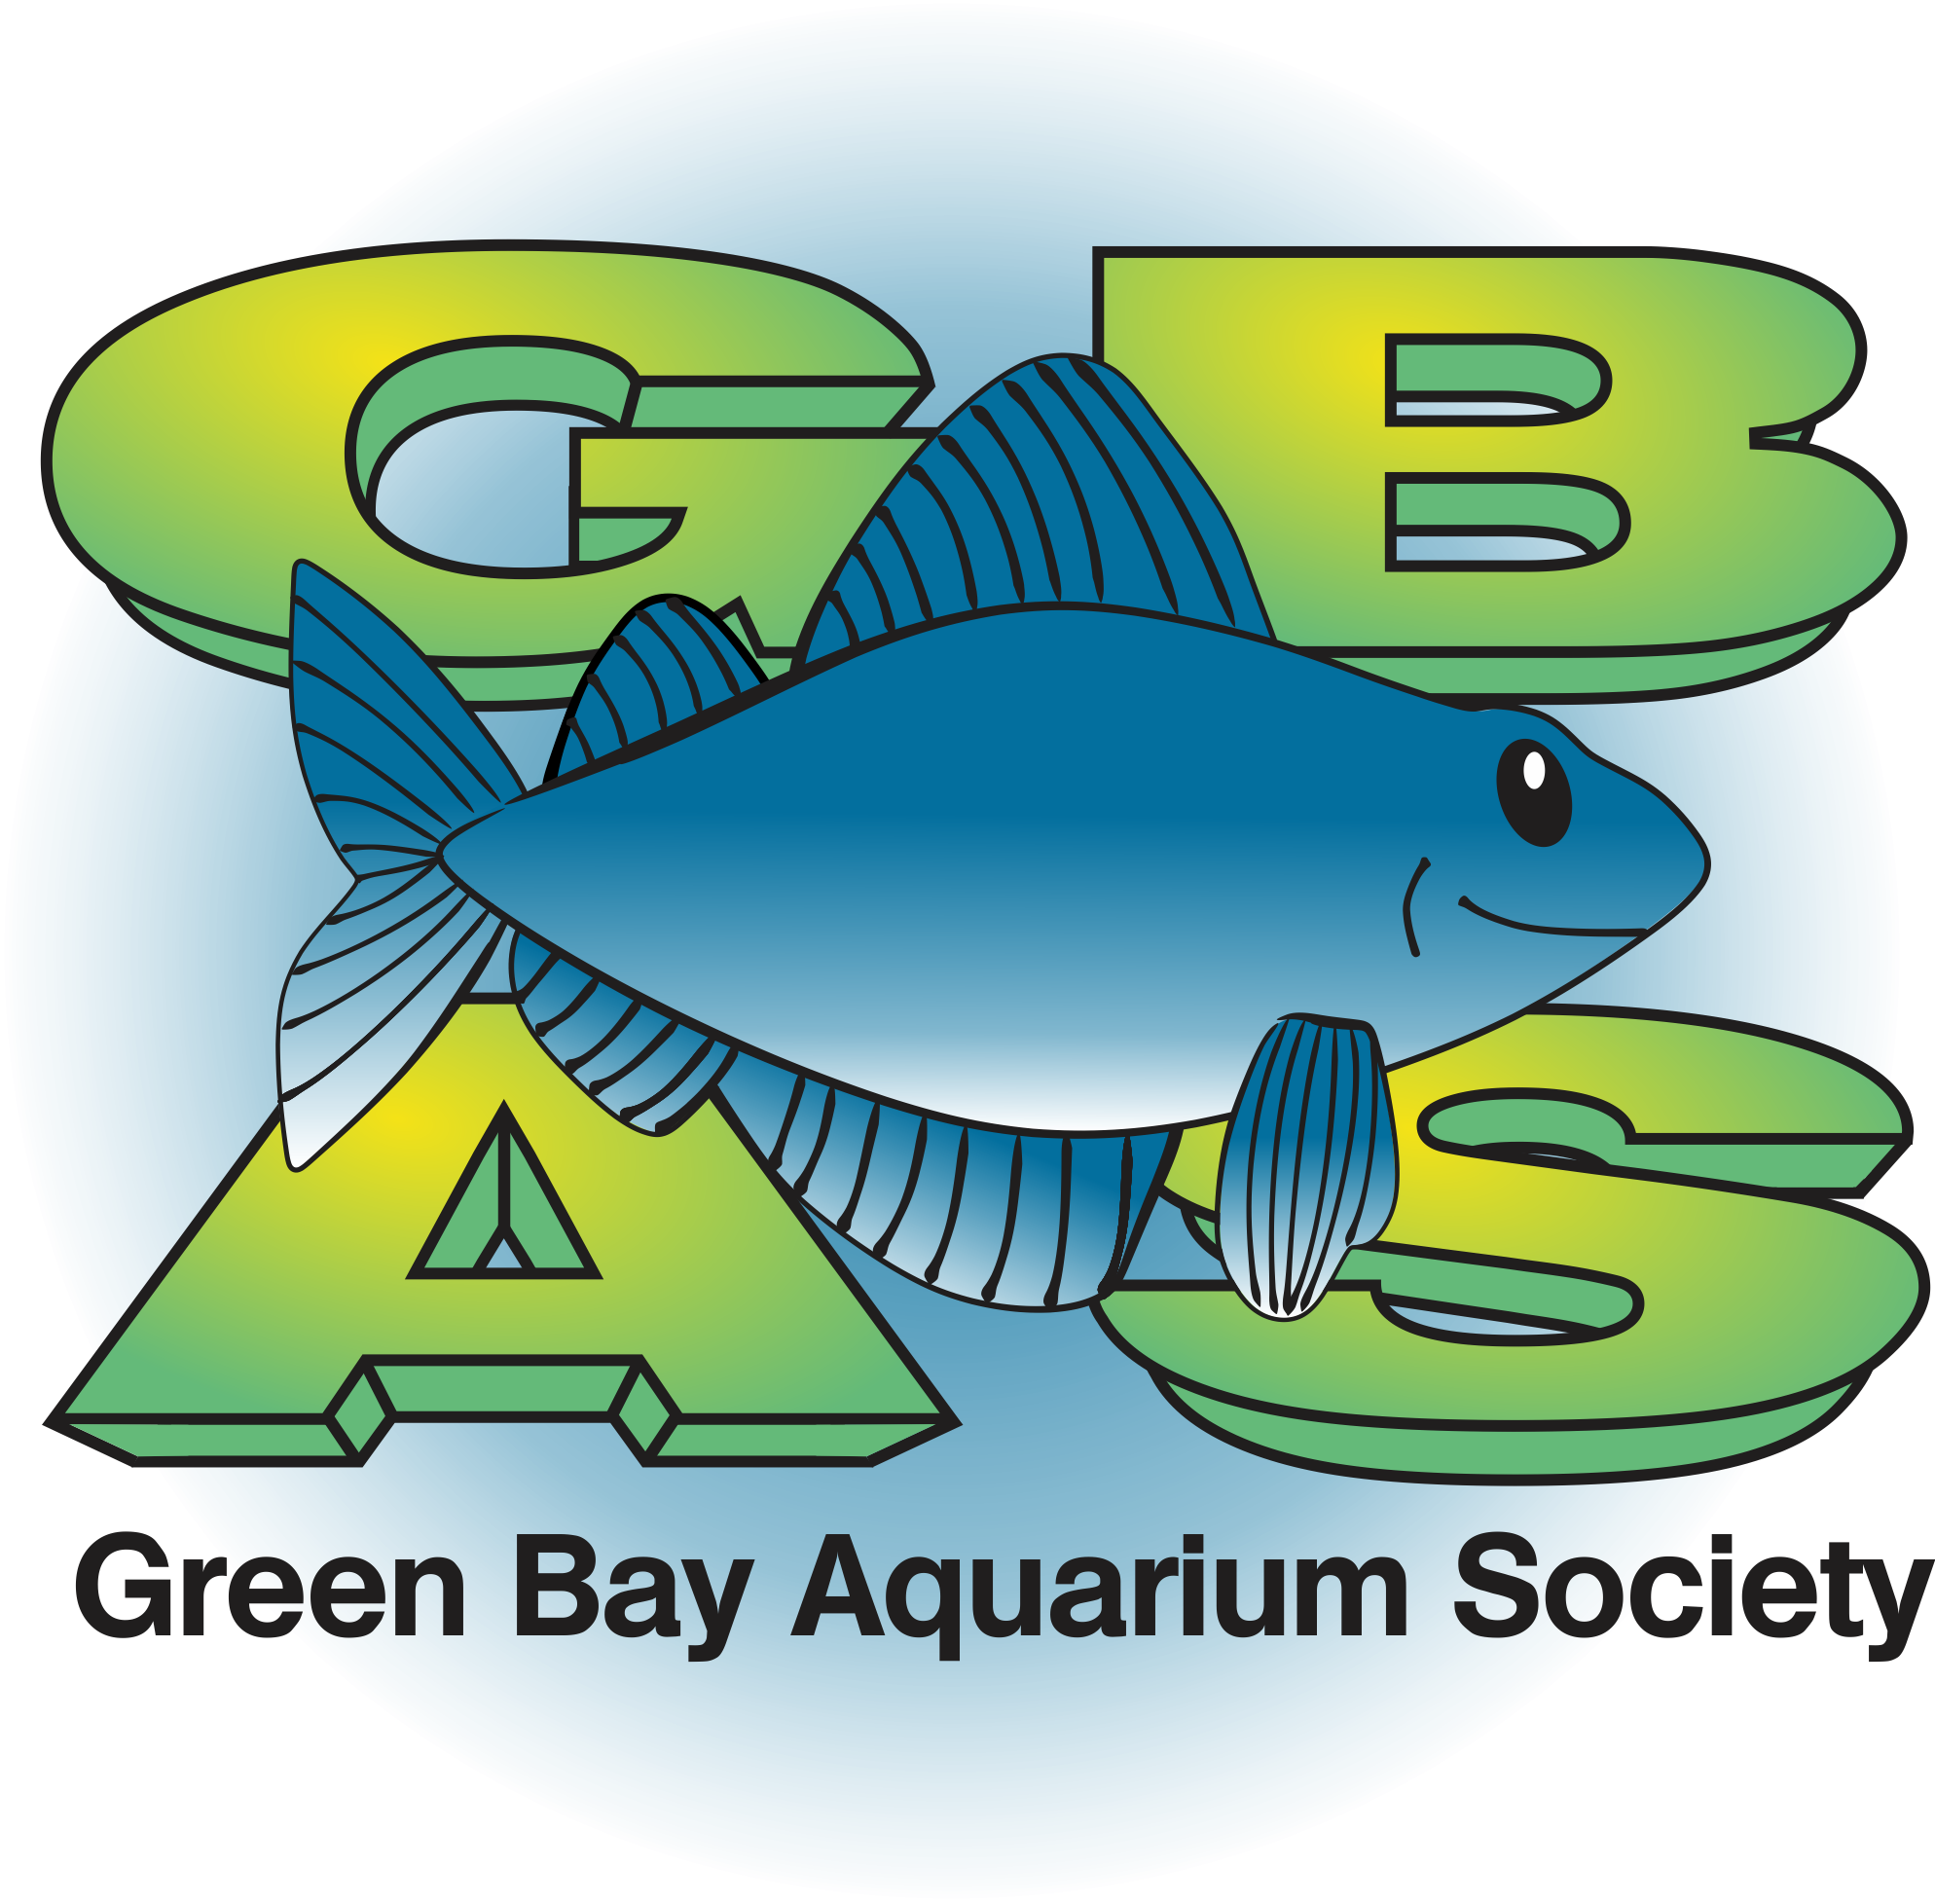 Green Bay Aquarium Club to Hold Fundraiser For Neighborhood Nature Center